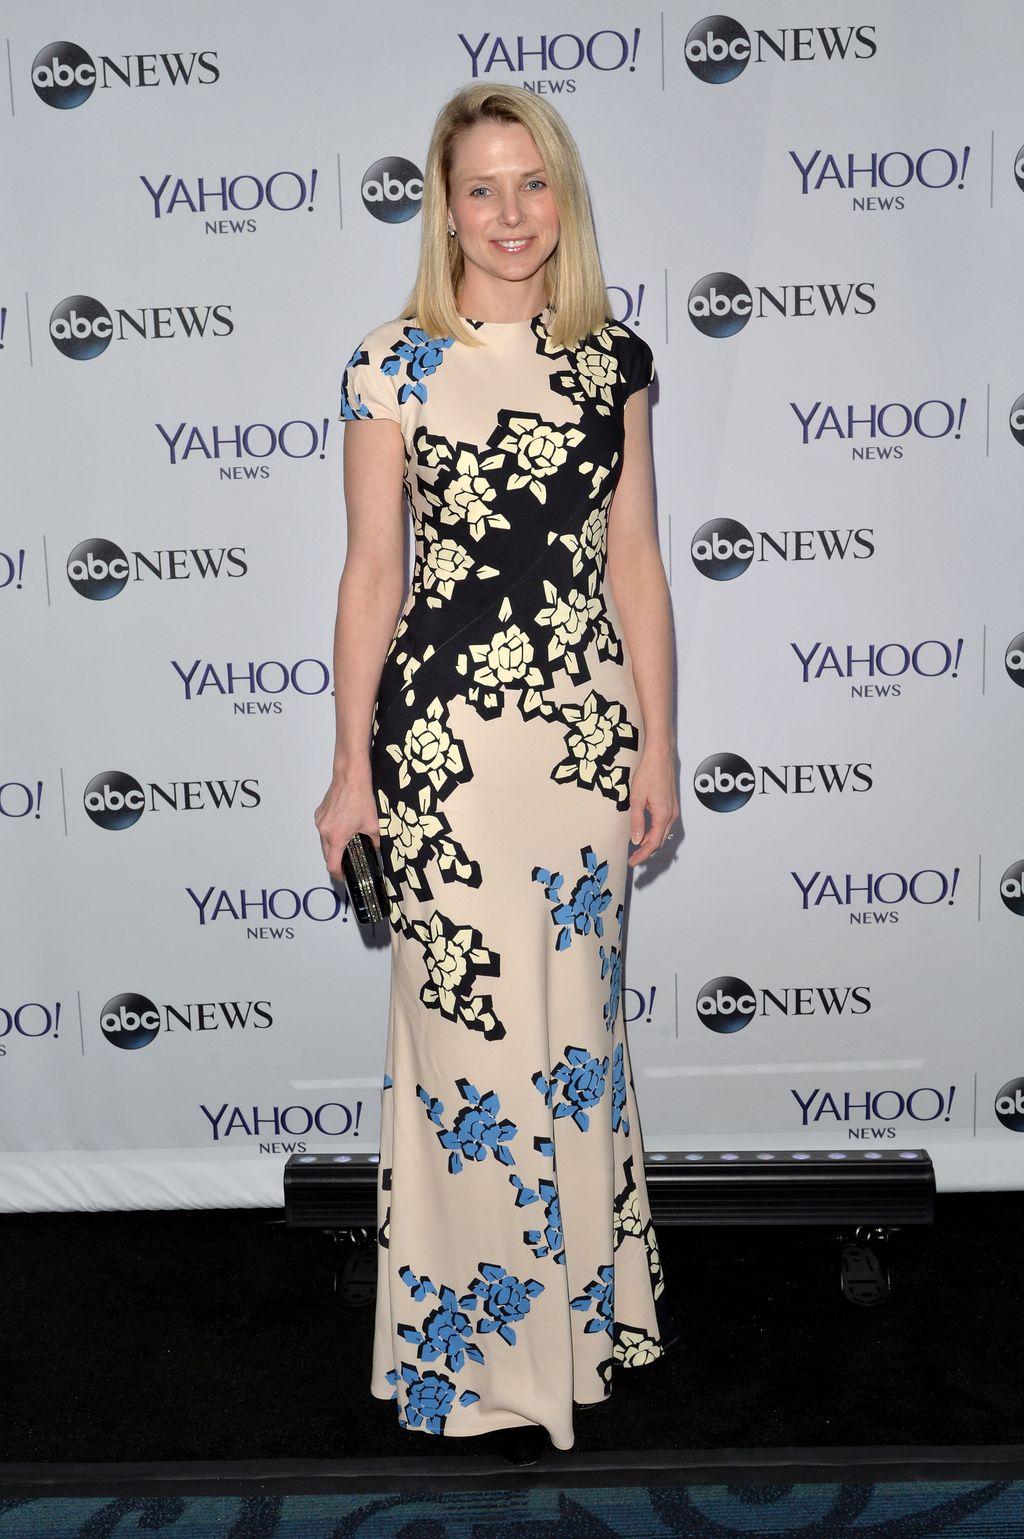 Marissa Mayer, wanita dengan paras cantik ini, resmi ditunjuk sebagai Chief Executive Officer (CEO) Yahoo pada tahun 2012.(Foto: GettyImages)